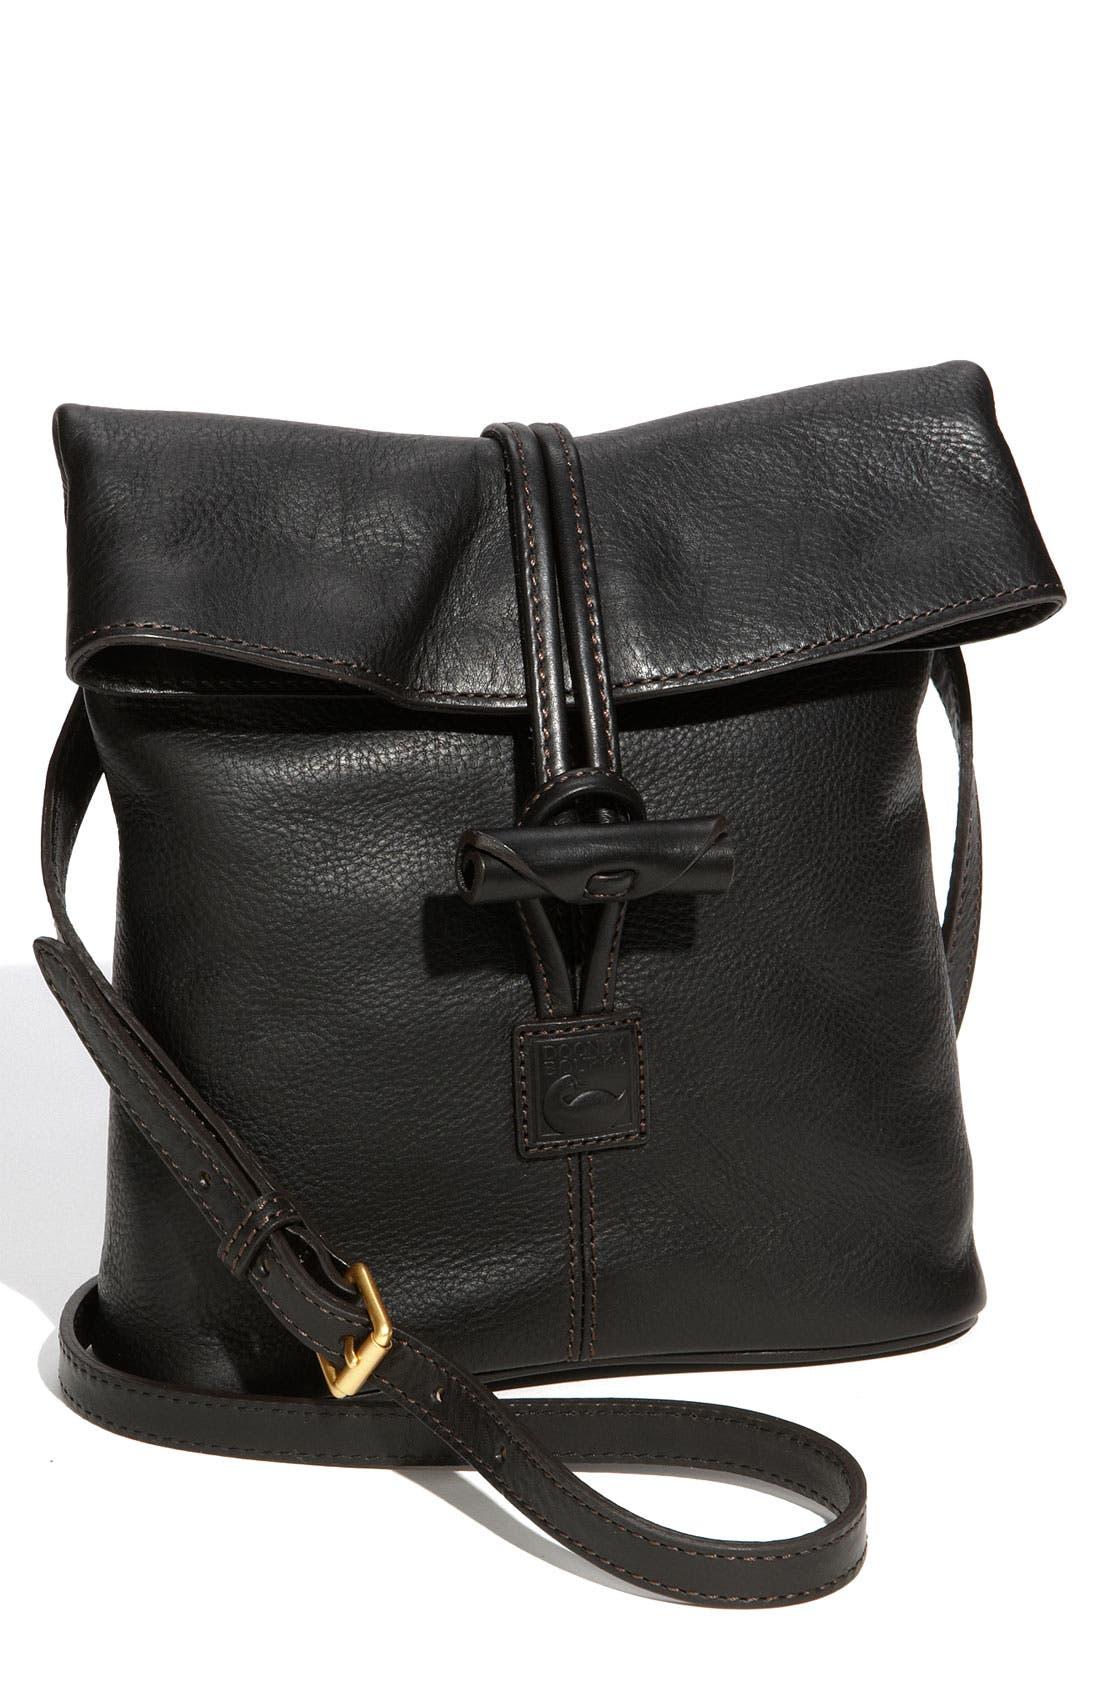 Main Image - Dooney & Bourke 'Florentine Toggle' Crossbody Bag